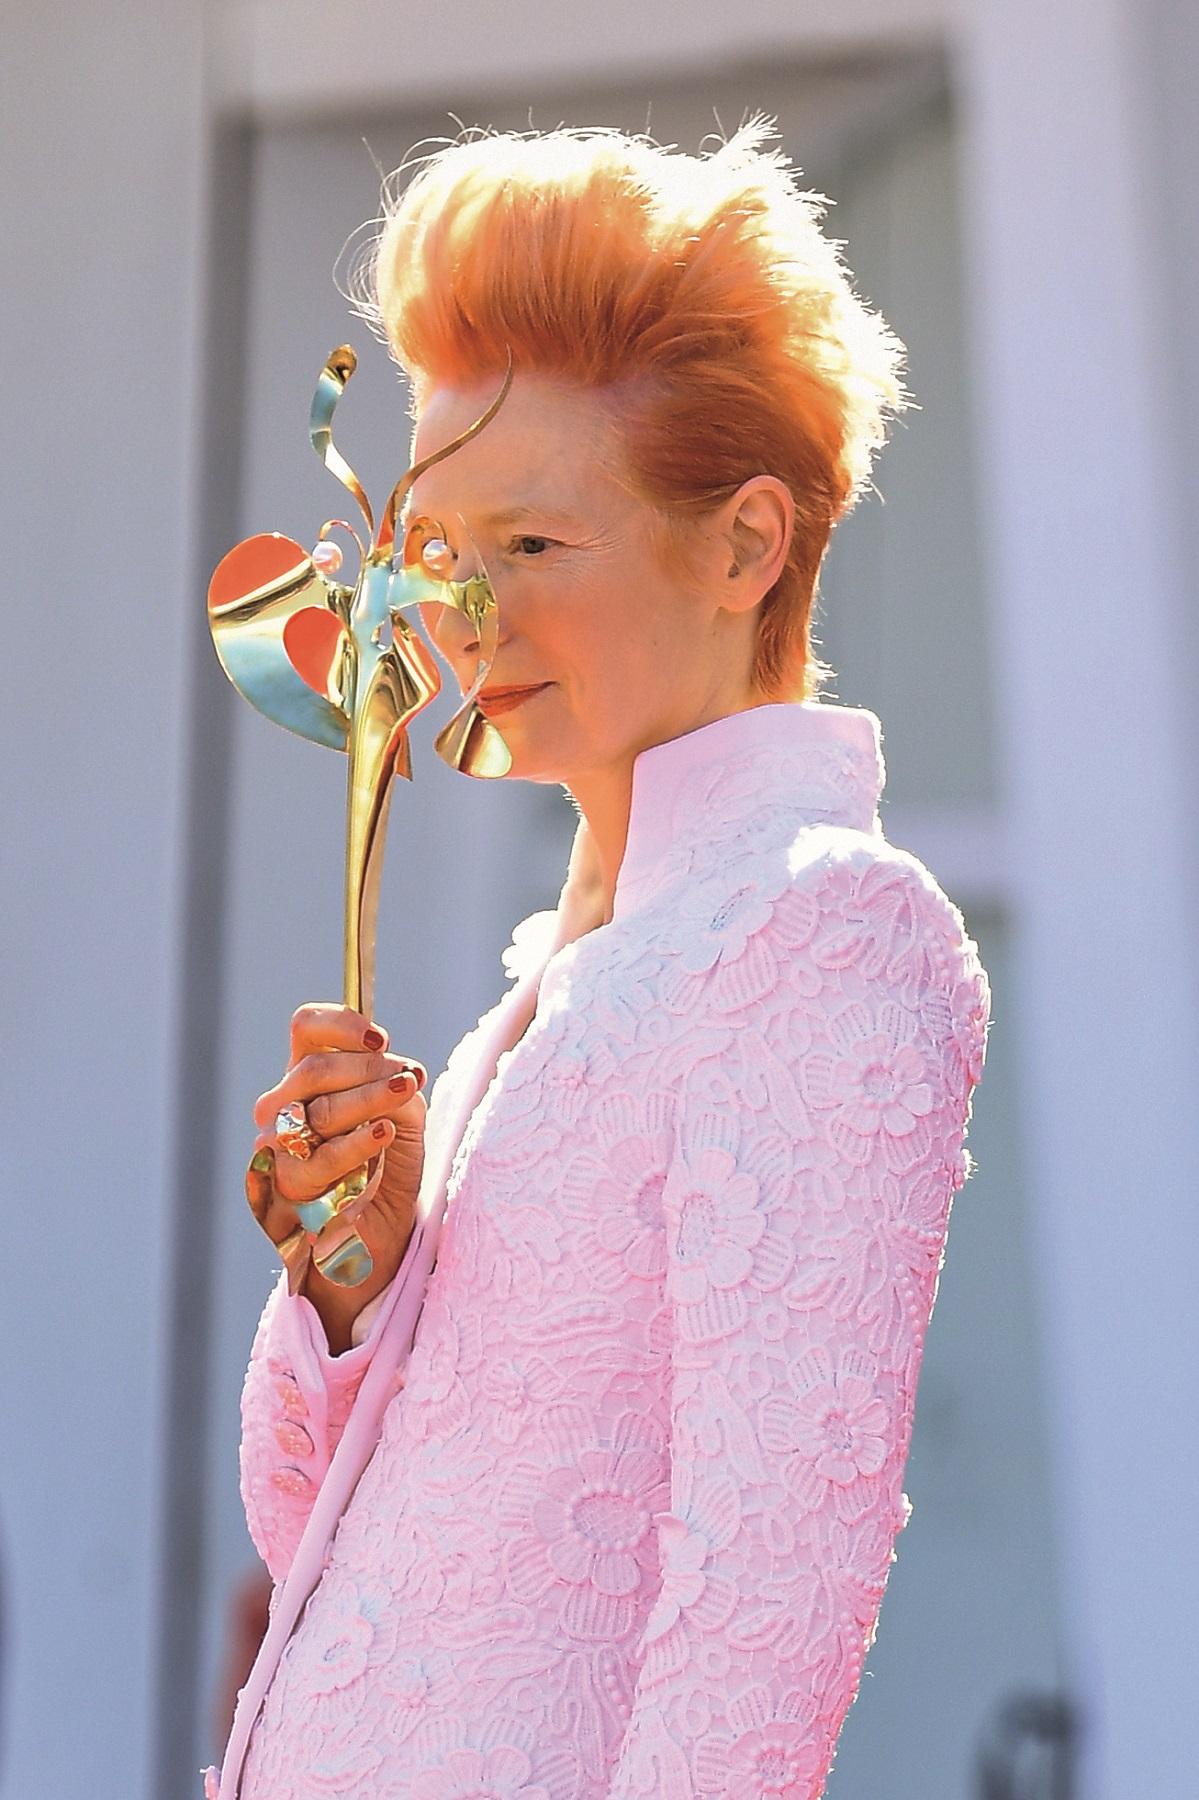 VENICE, ITALY - SEPTEMBER 03: Tilda Swinton walks the red carpet ahead of the movie